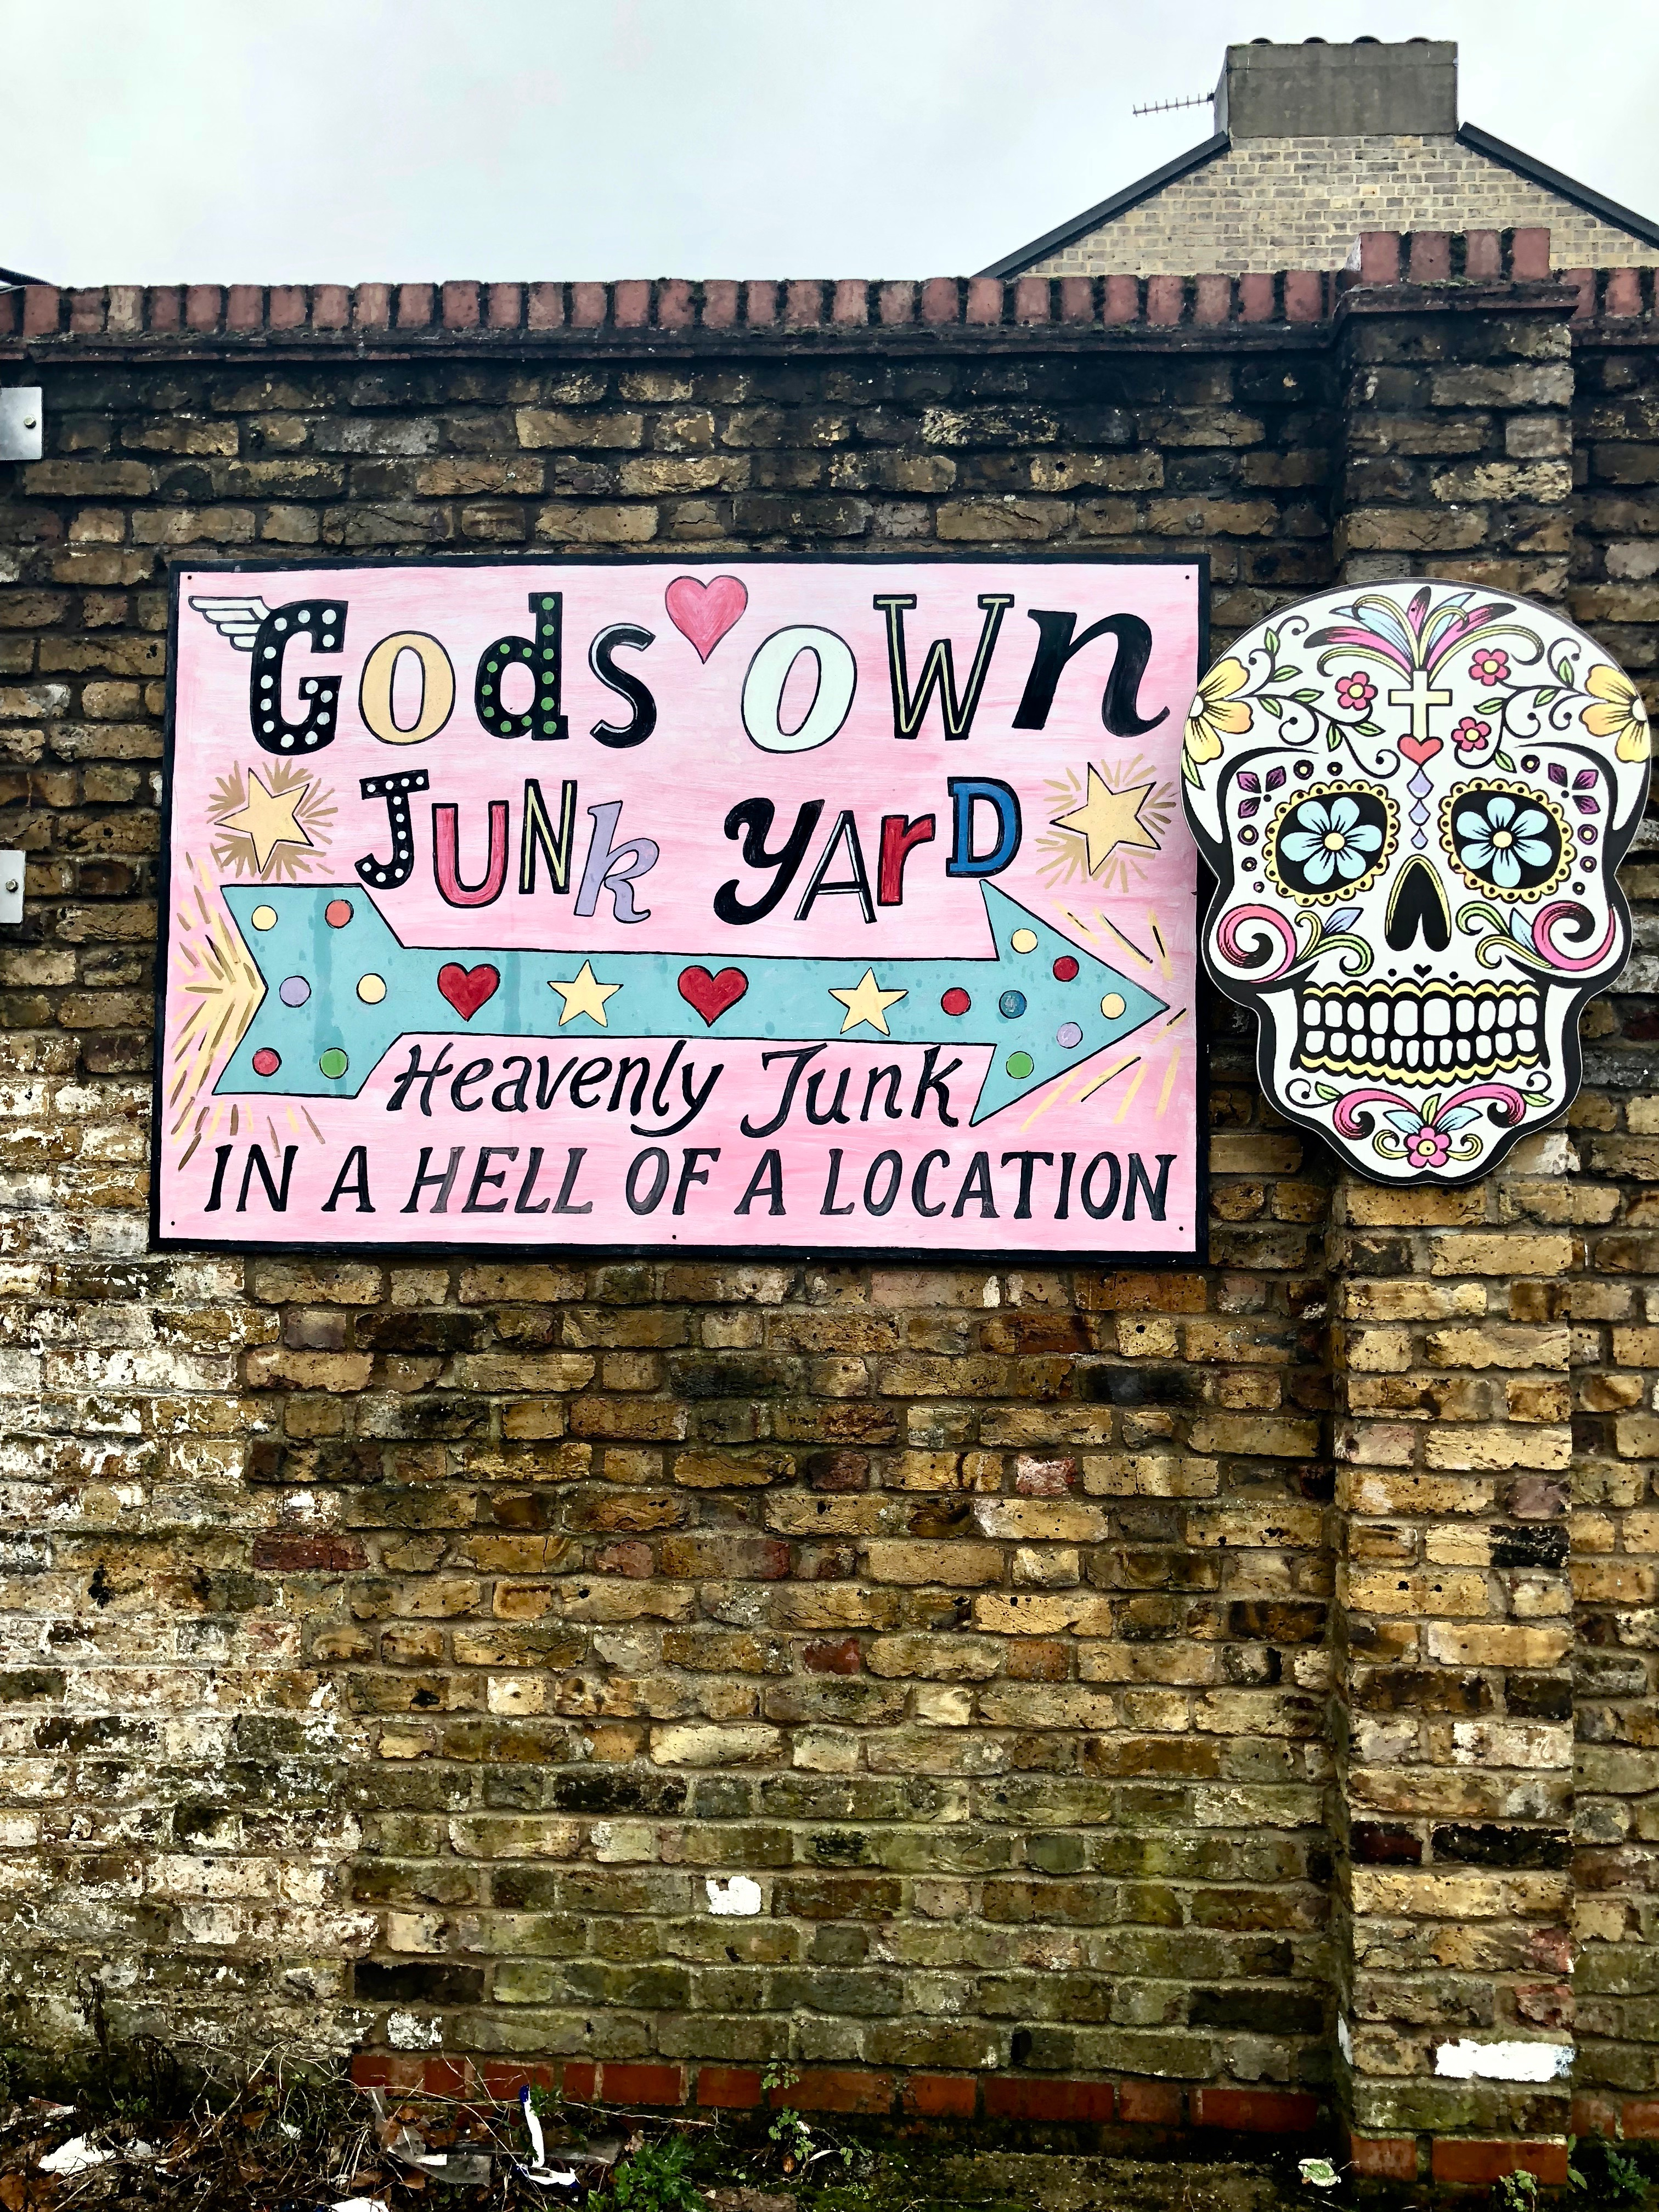 CAPAStudyAbroad_London_Spring2018_From Kelly Allen - Outside God's Own Junkyard